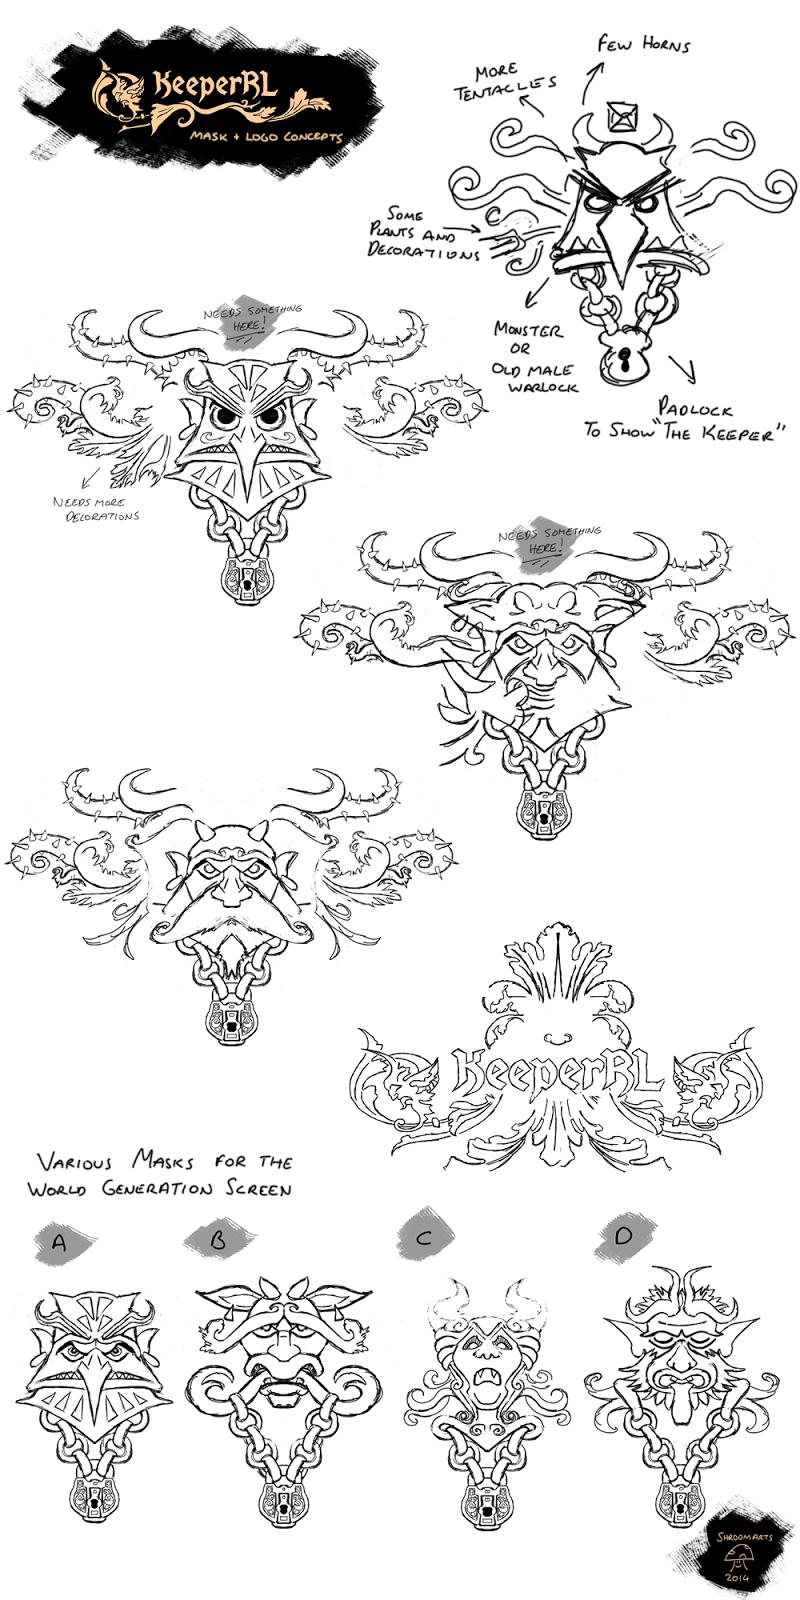 Keeper RL mask and logo concepts